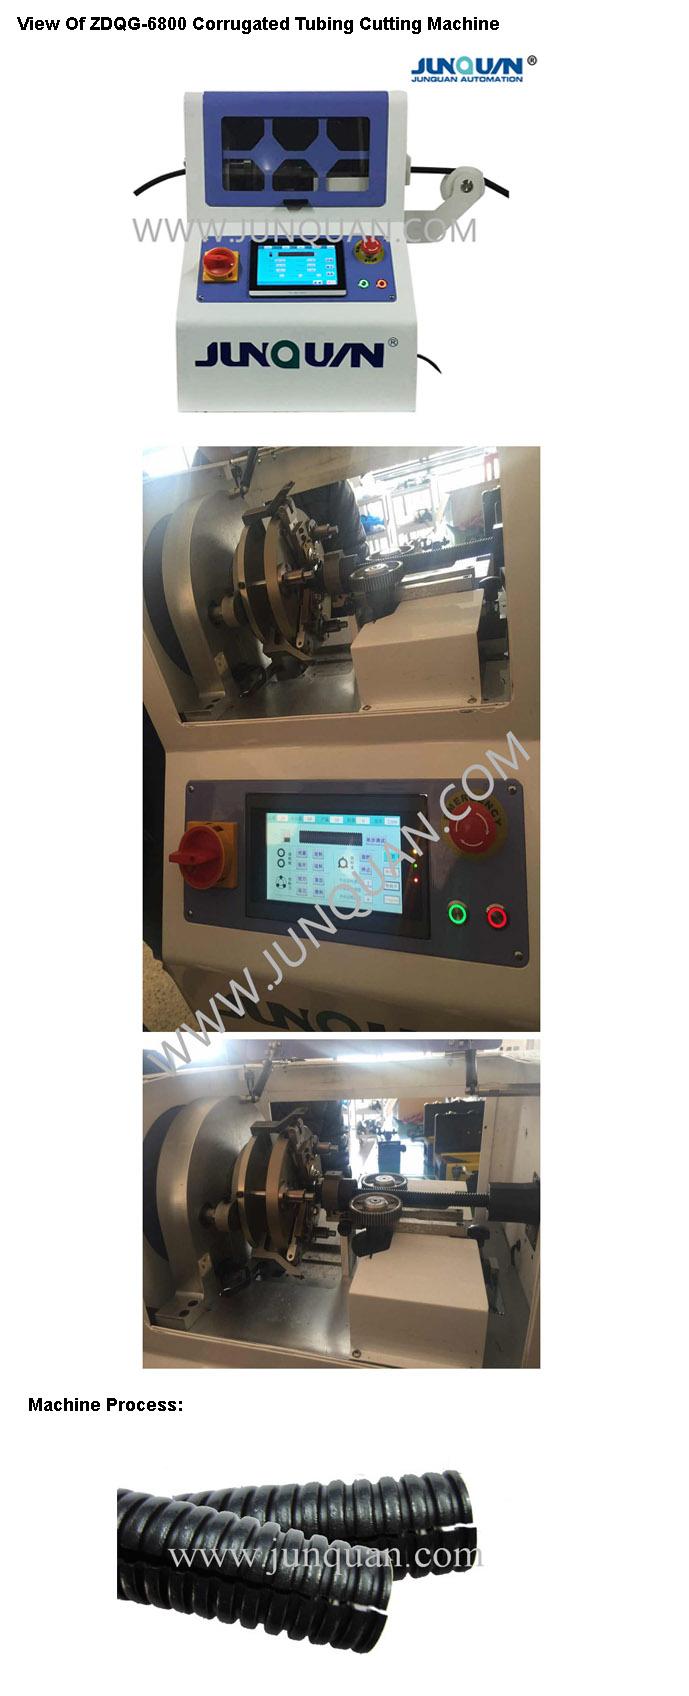 Corrguated Tubing Cutting Machine (ZDQG-6800)